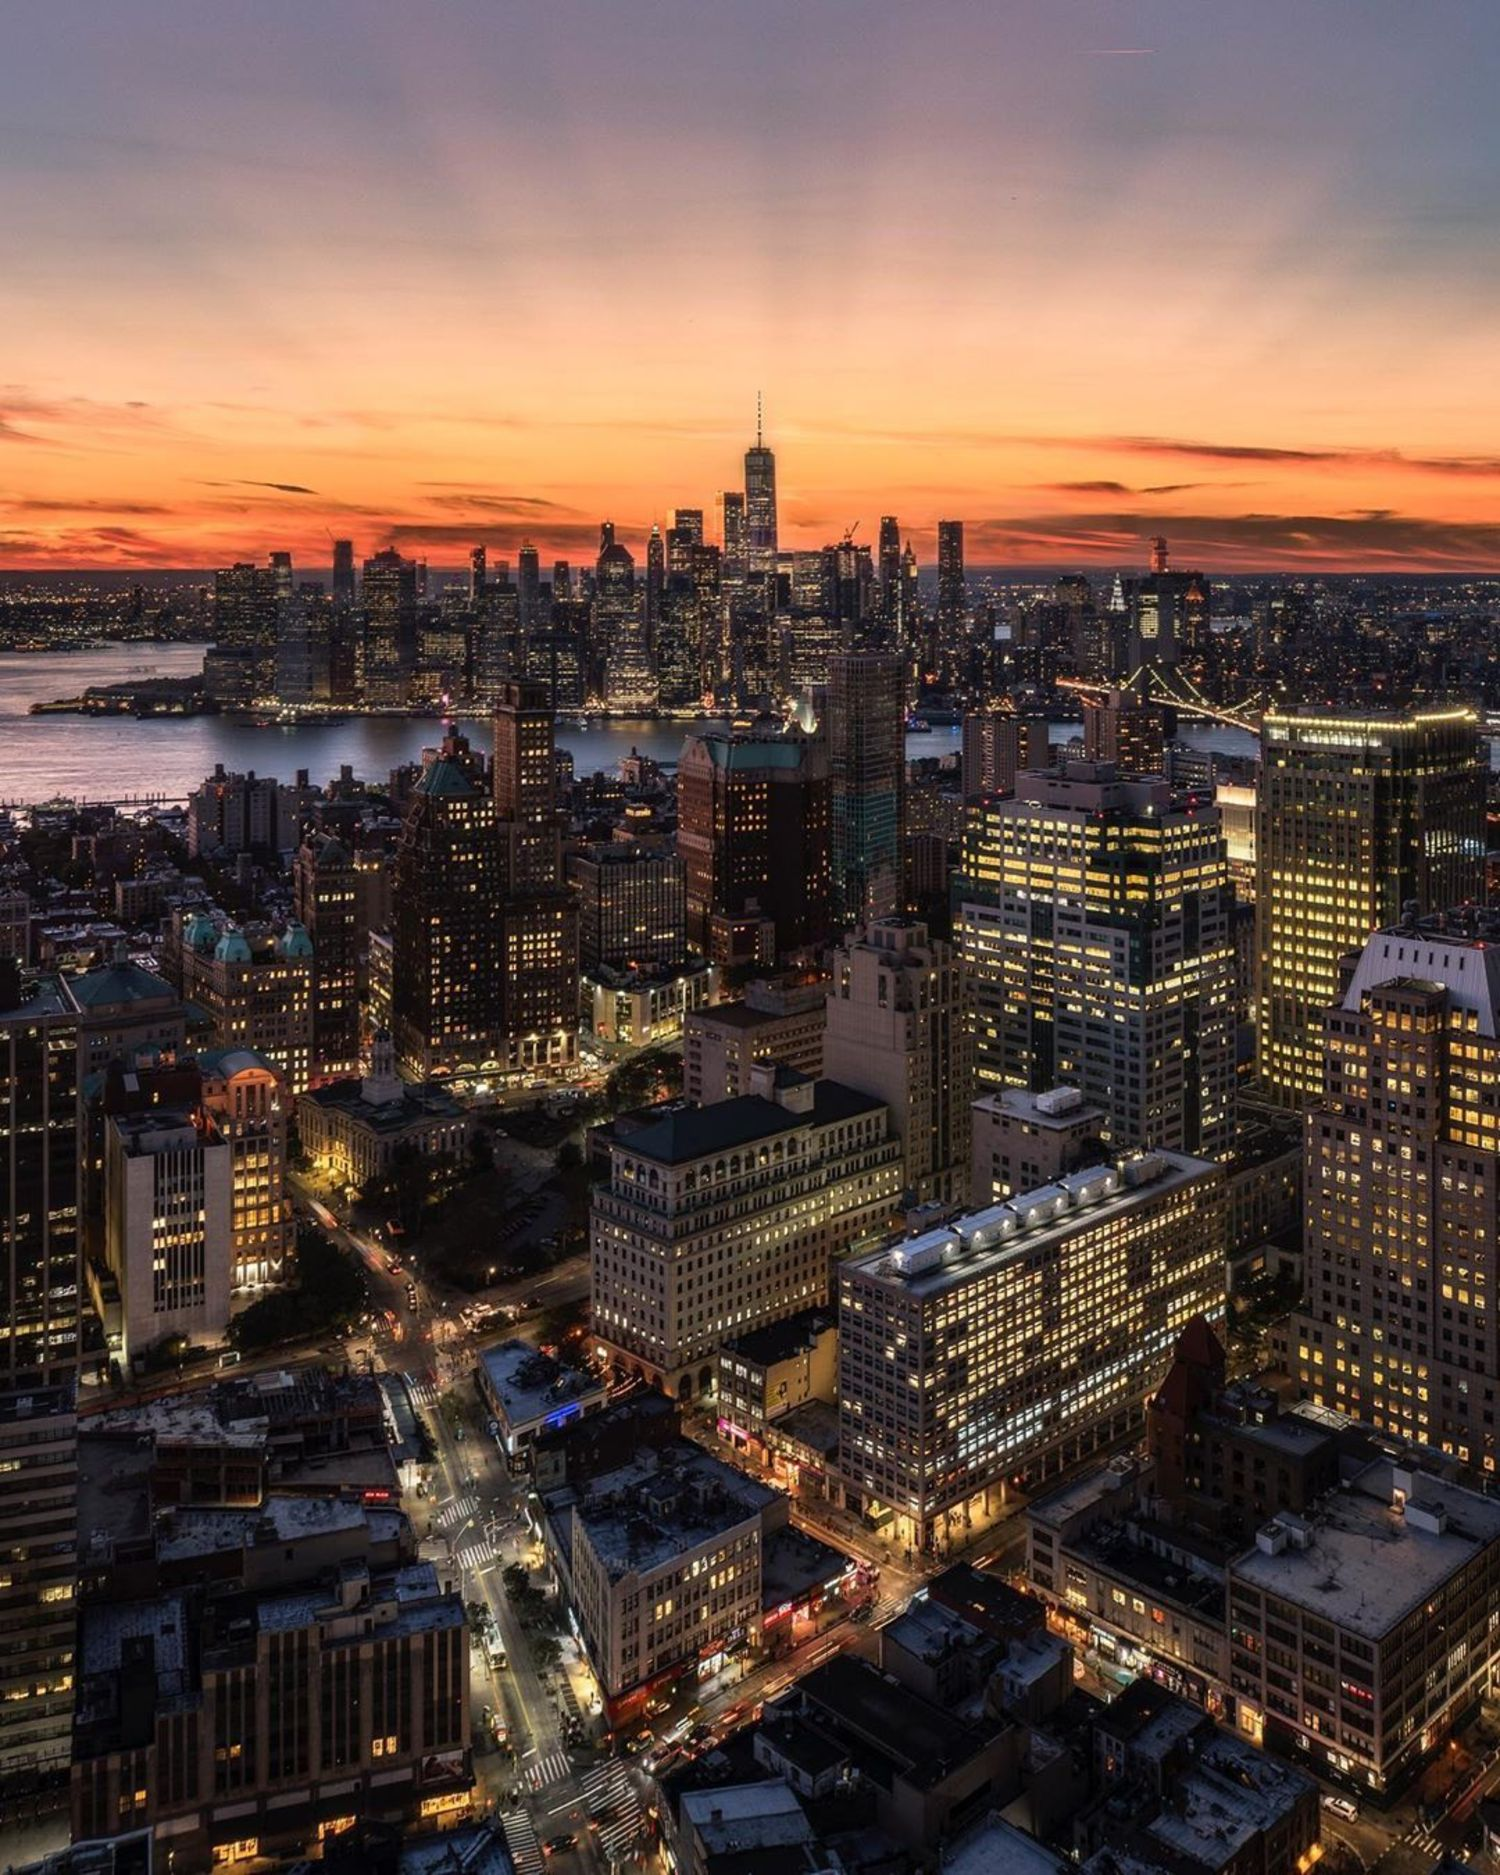 Sunset over New York, New York